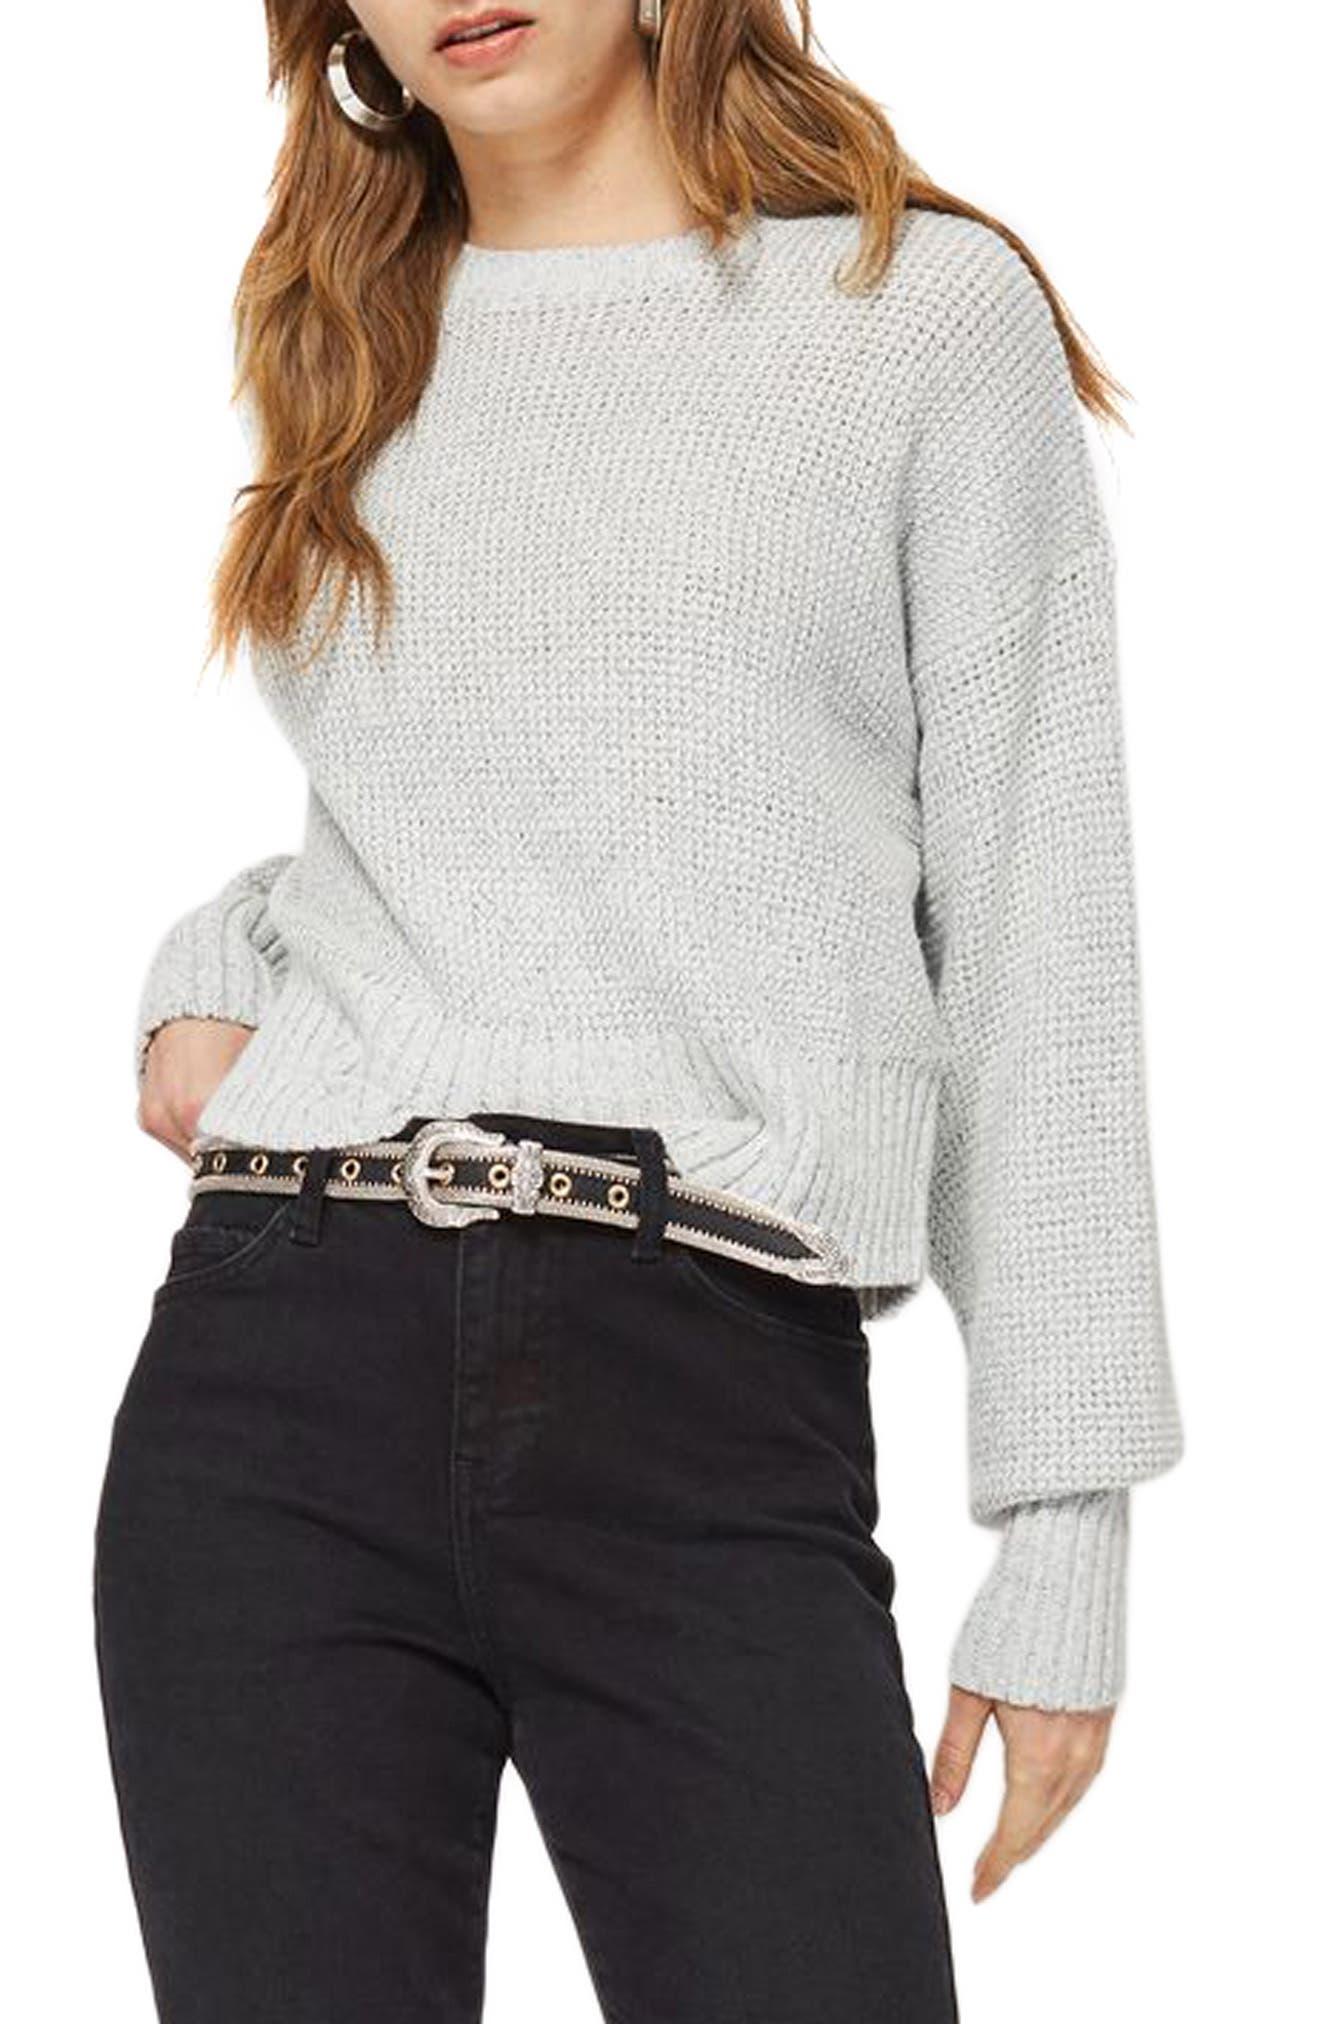 Topshop Petite Crop Sweater